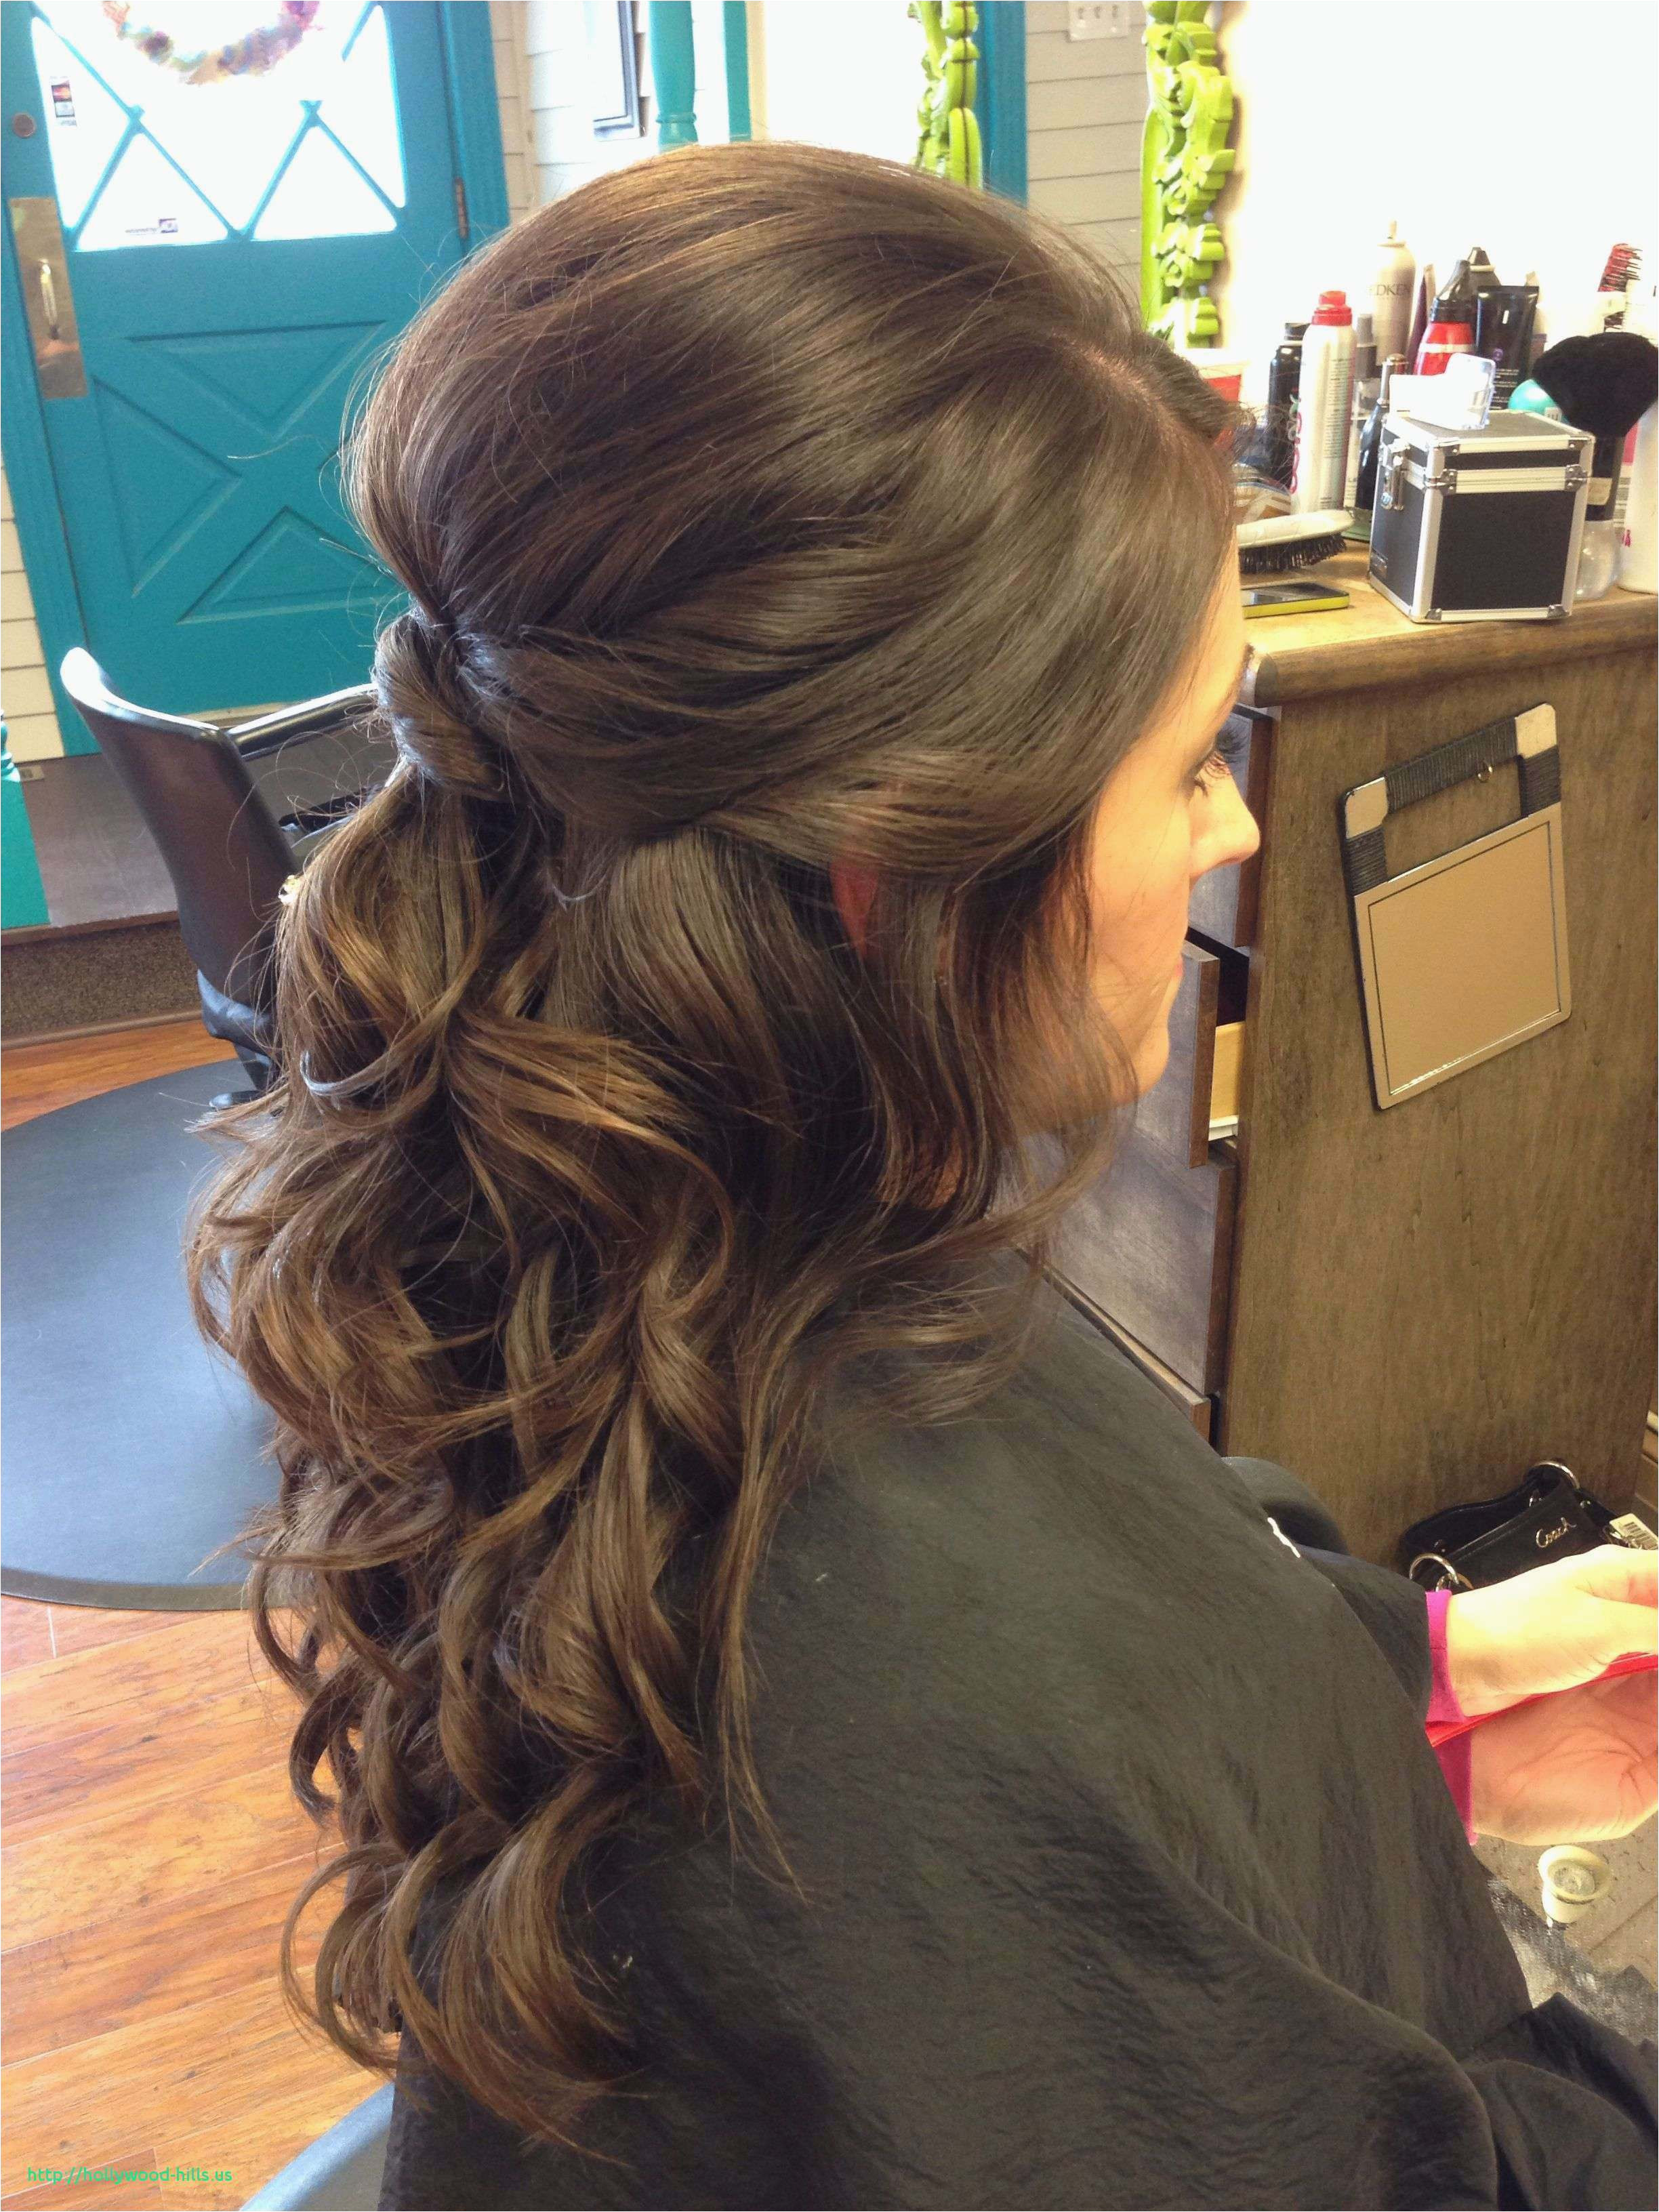 10 Wedding Hairstyles for Medium Length Hair Half Up Popular